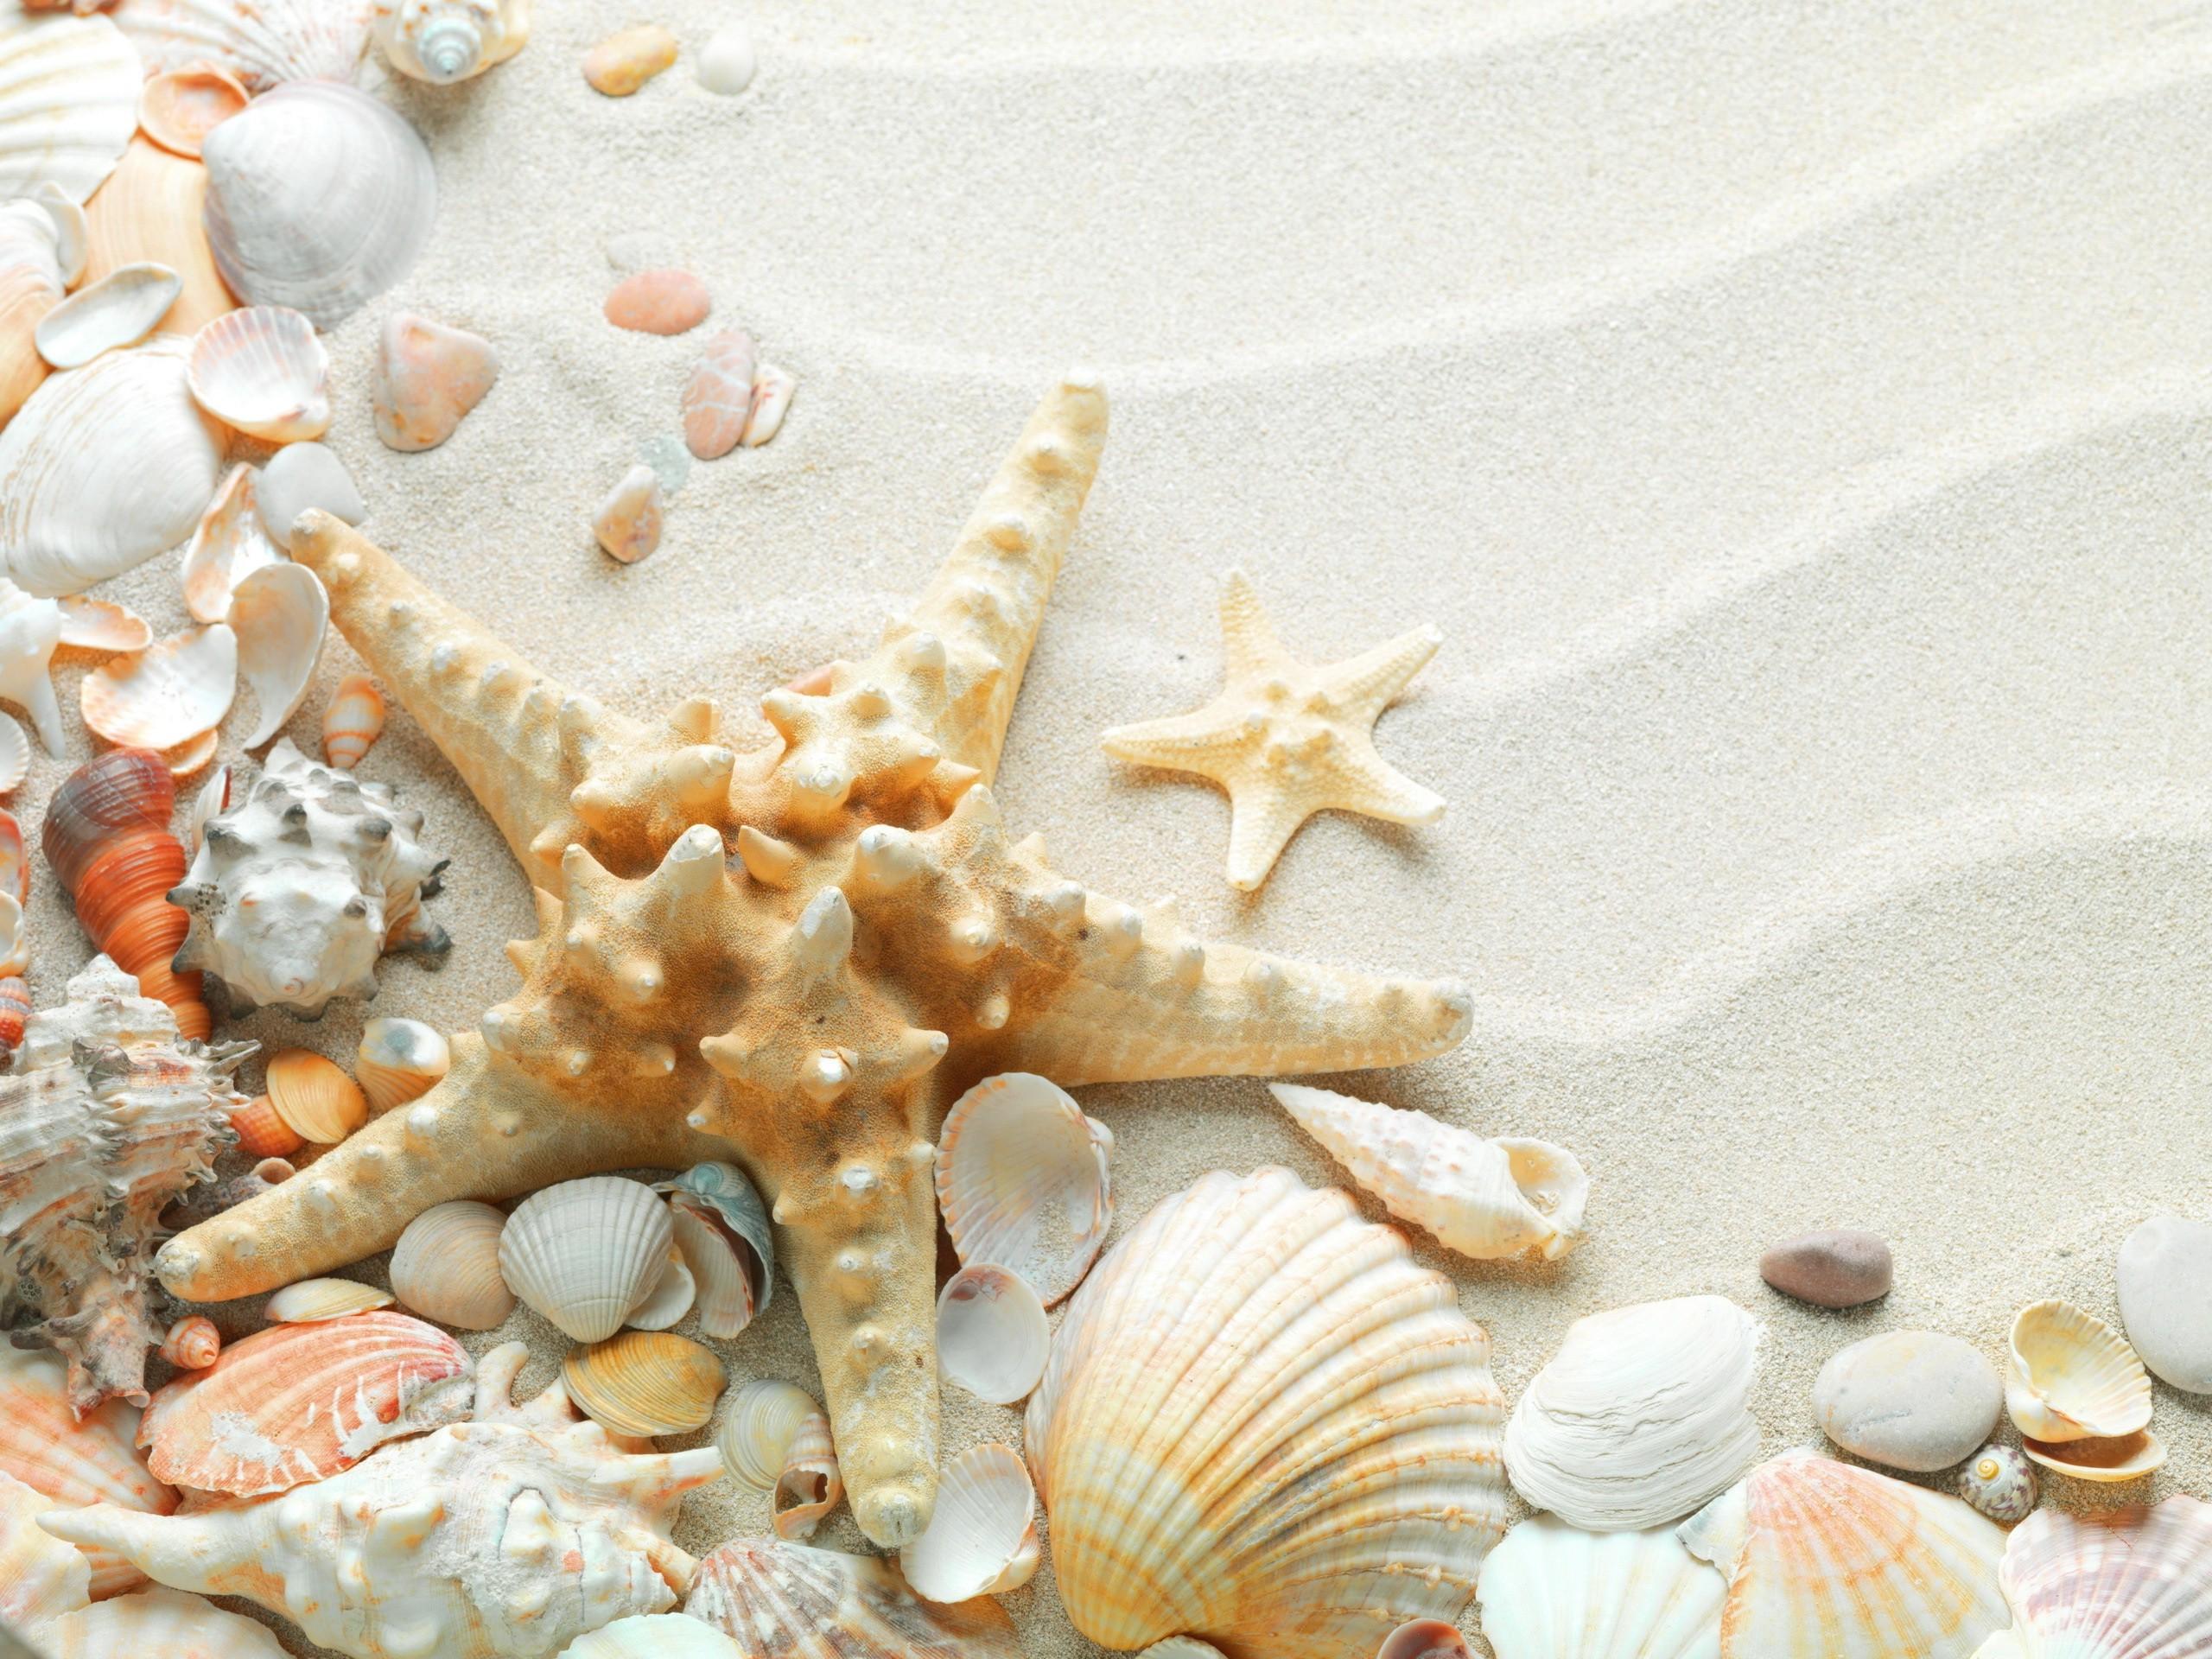 Sand Starfish Seashells White Sand HD Background Wallpaper 2560x1920